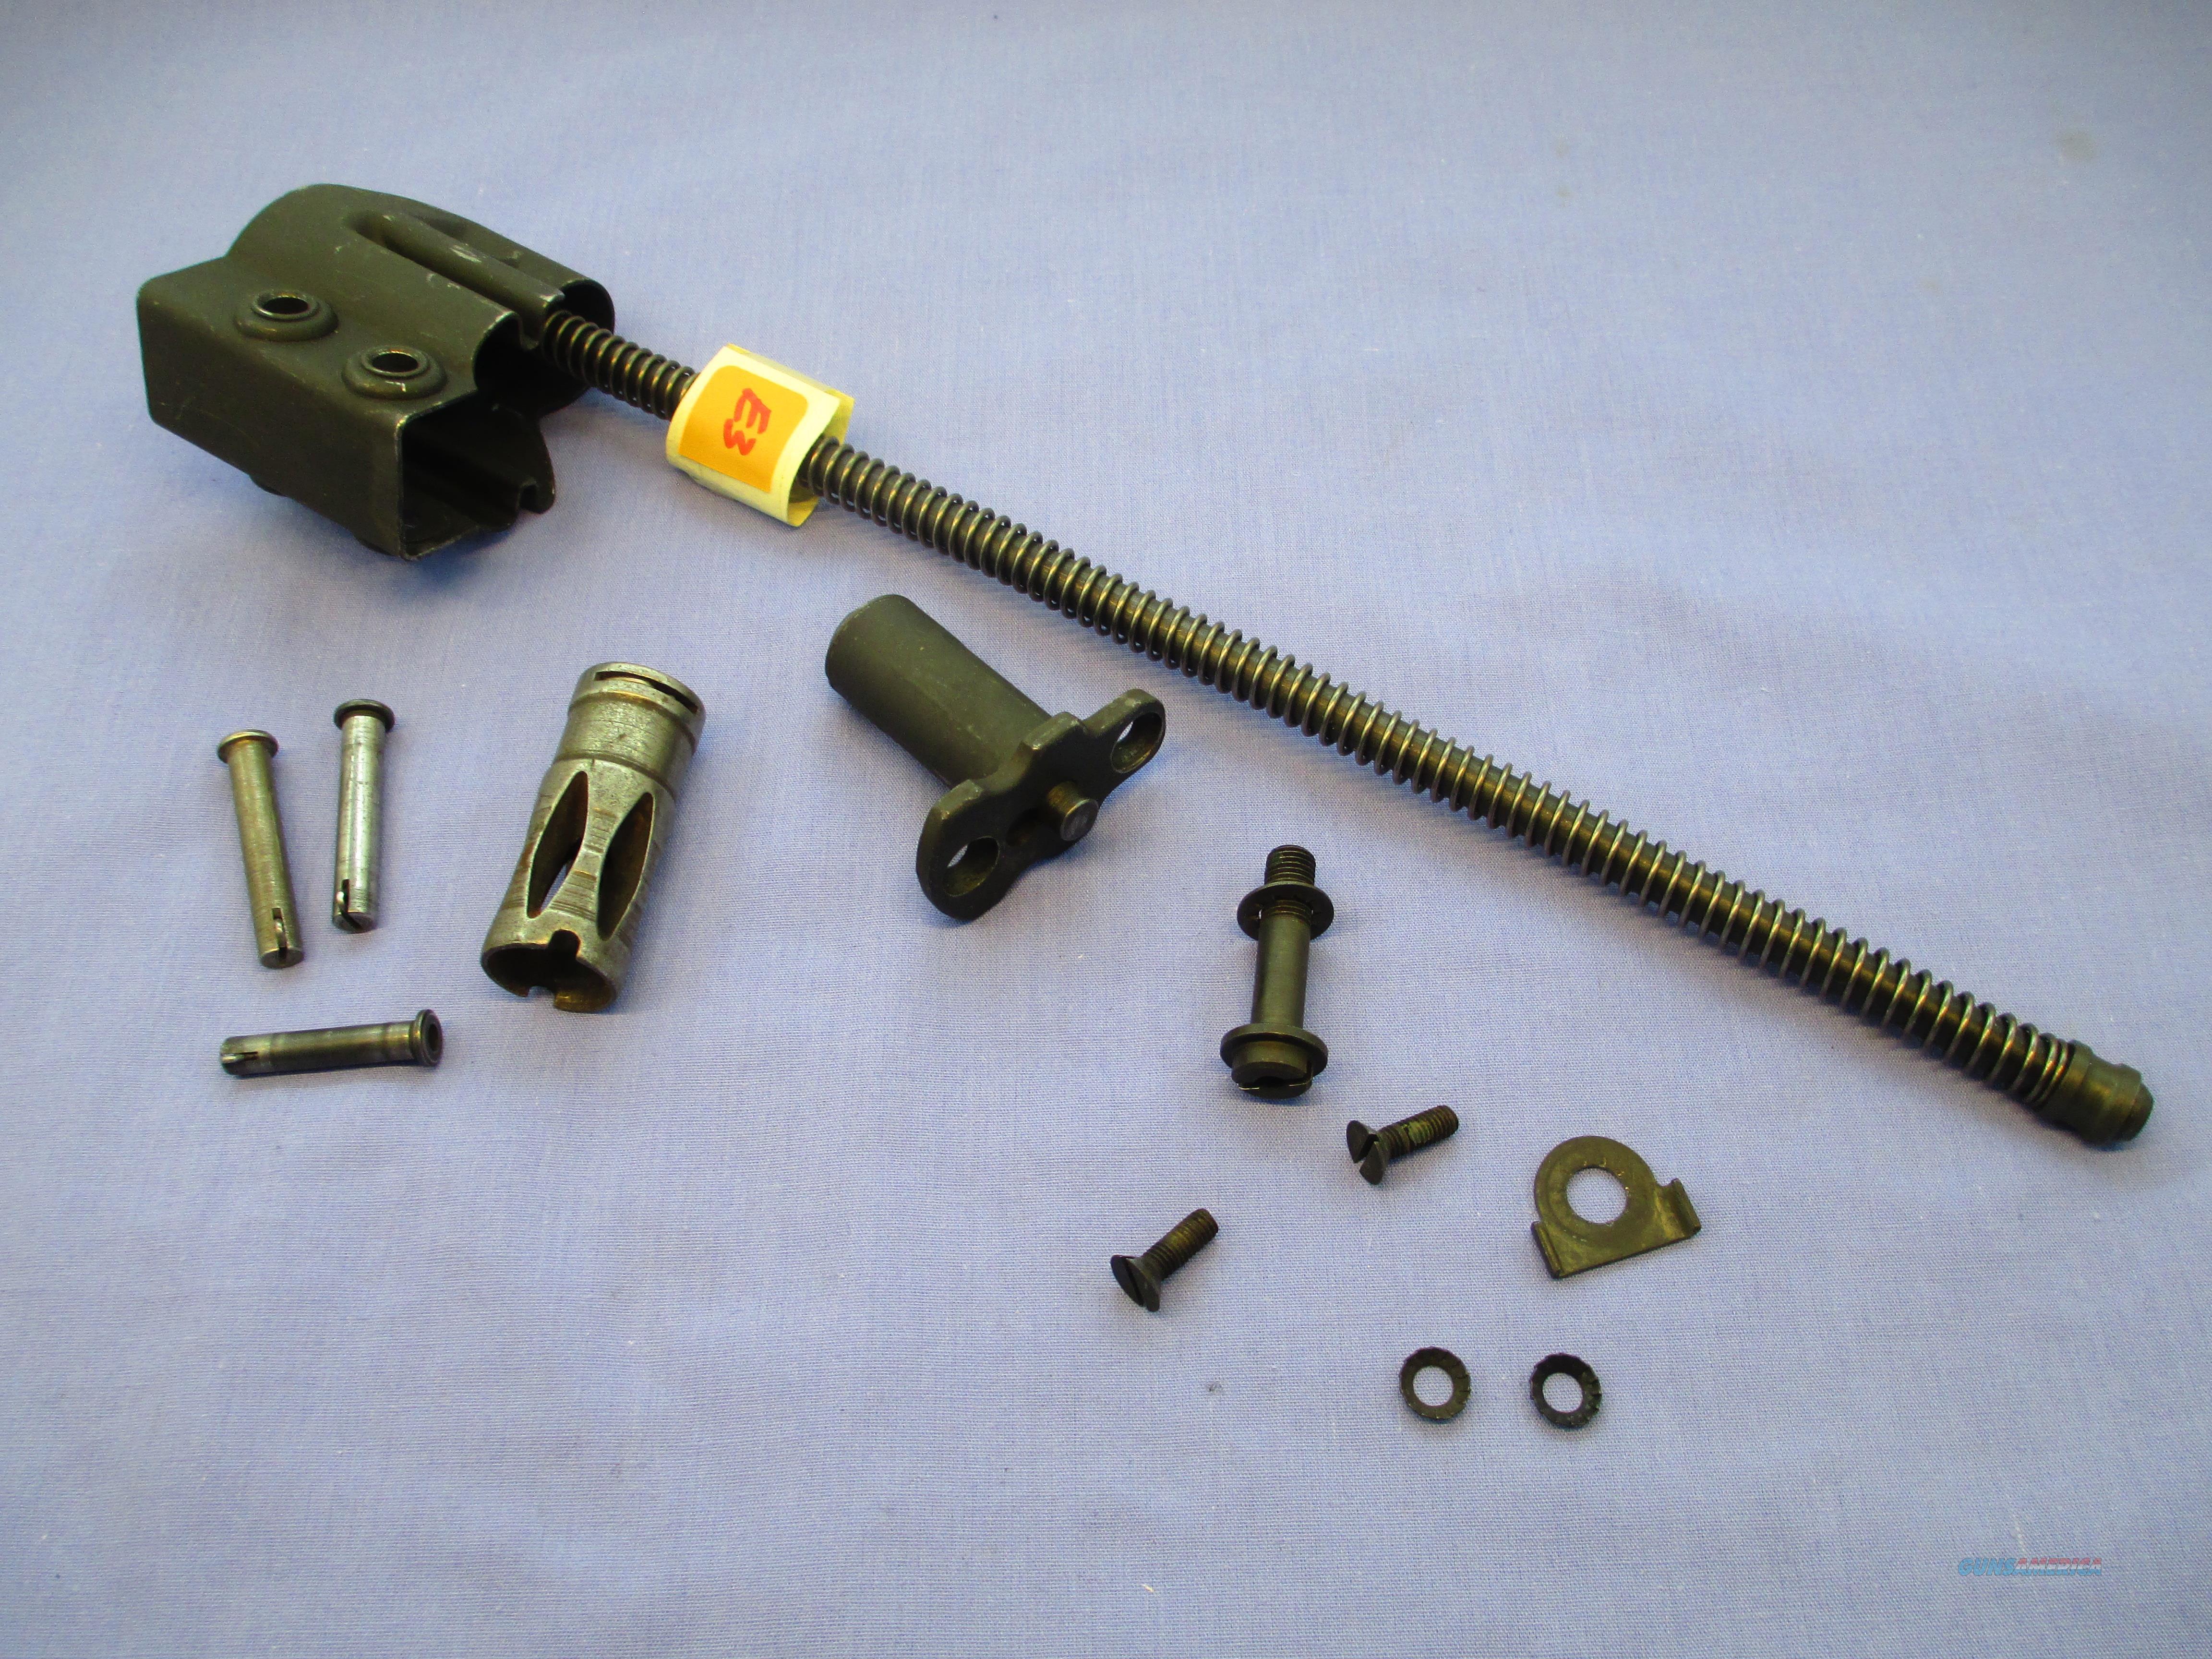 HK G3 HK91 HANGER SET PLUS  Non-Guns > Gun Parts > Military - Foreign